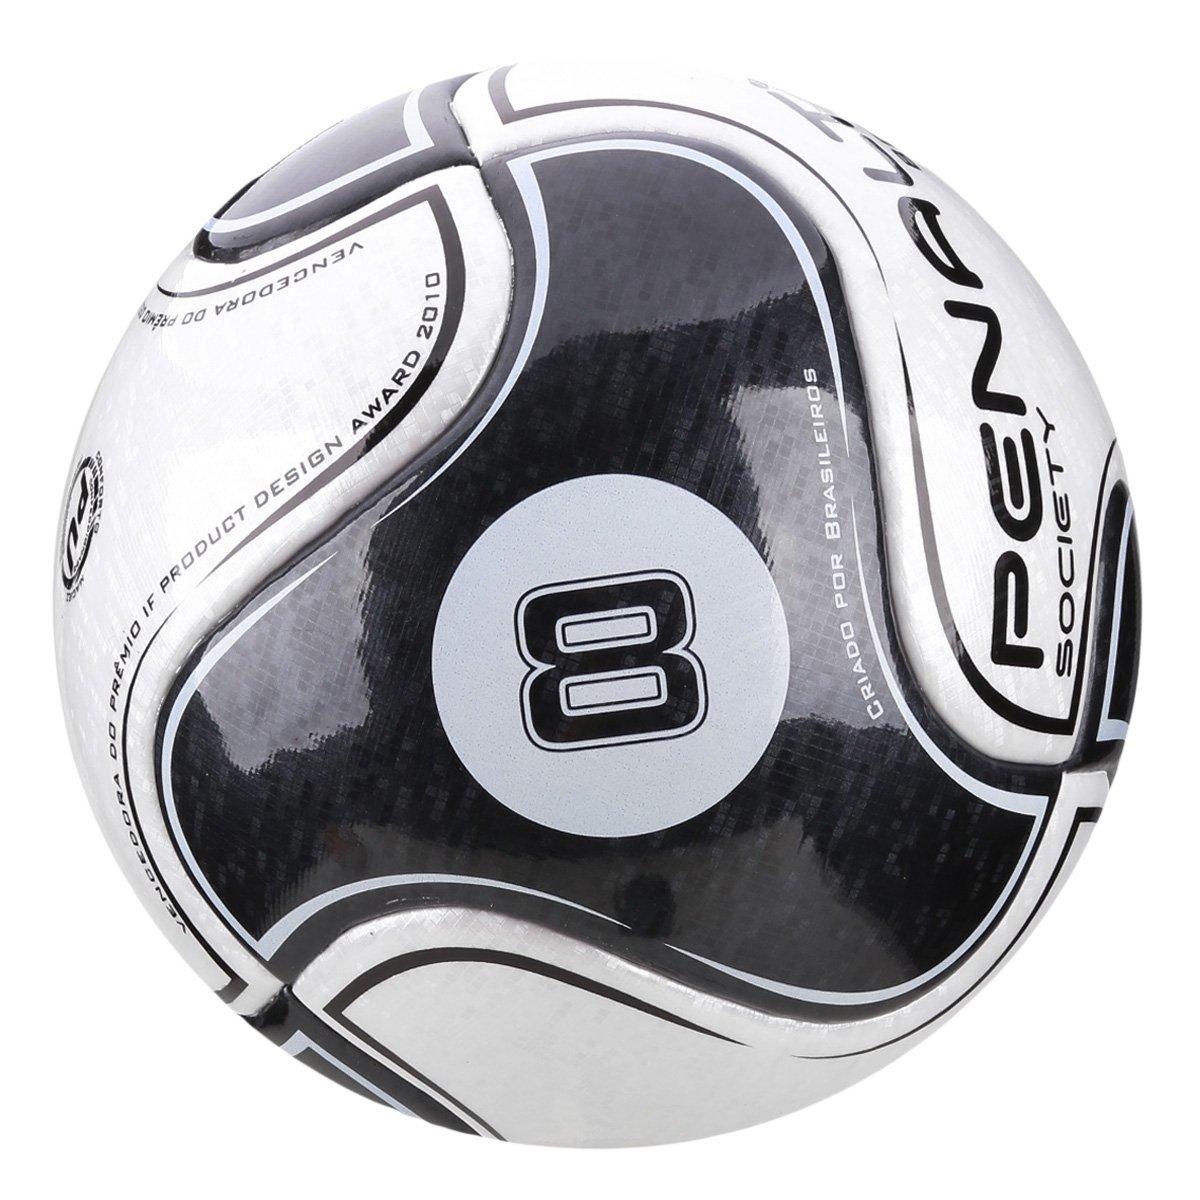 458530ad97b26 Bola de Futebol Society Penalty 8 IX - Branco e Preto - Compre Agora ...